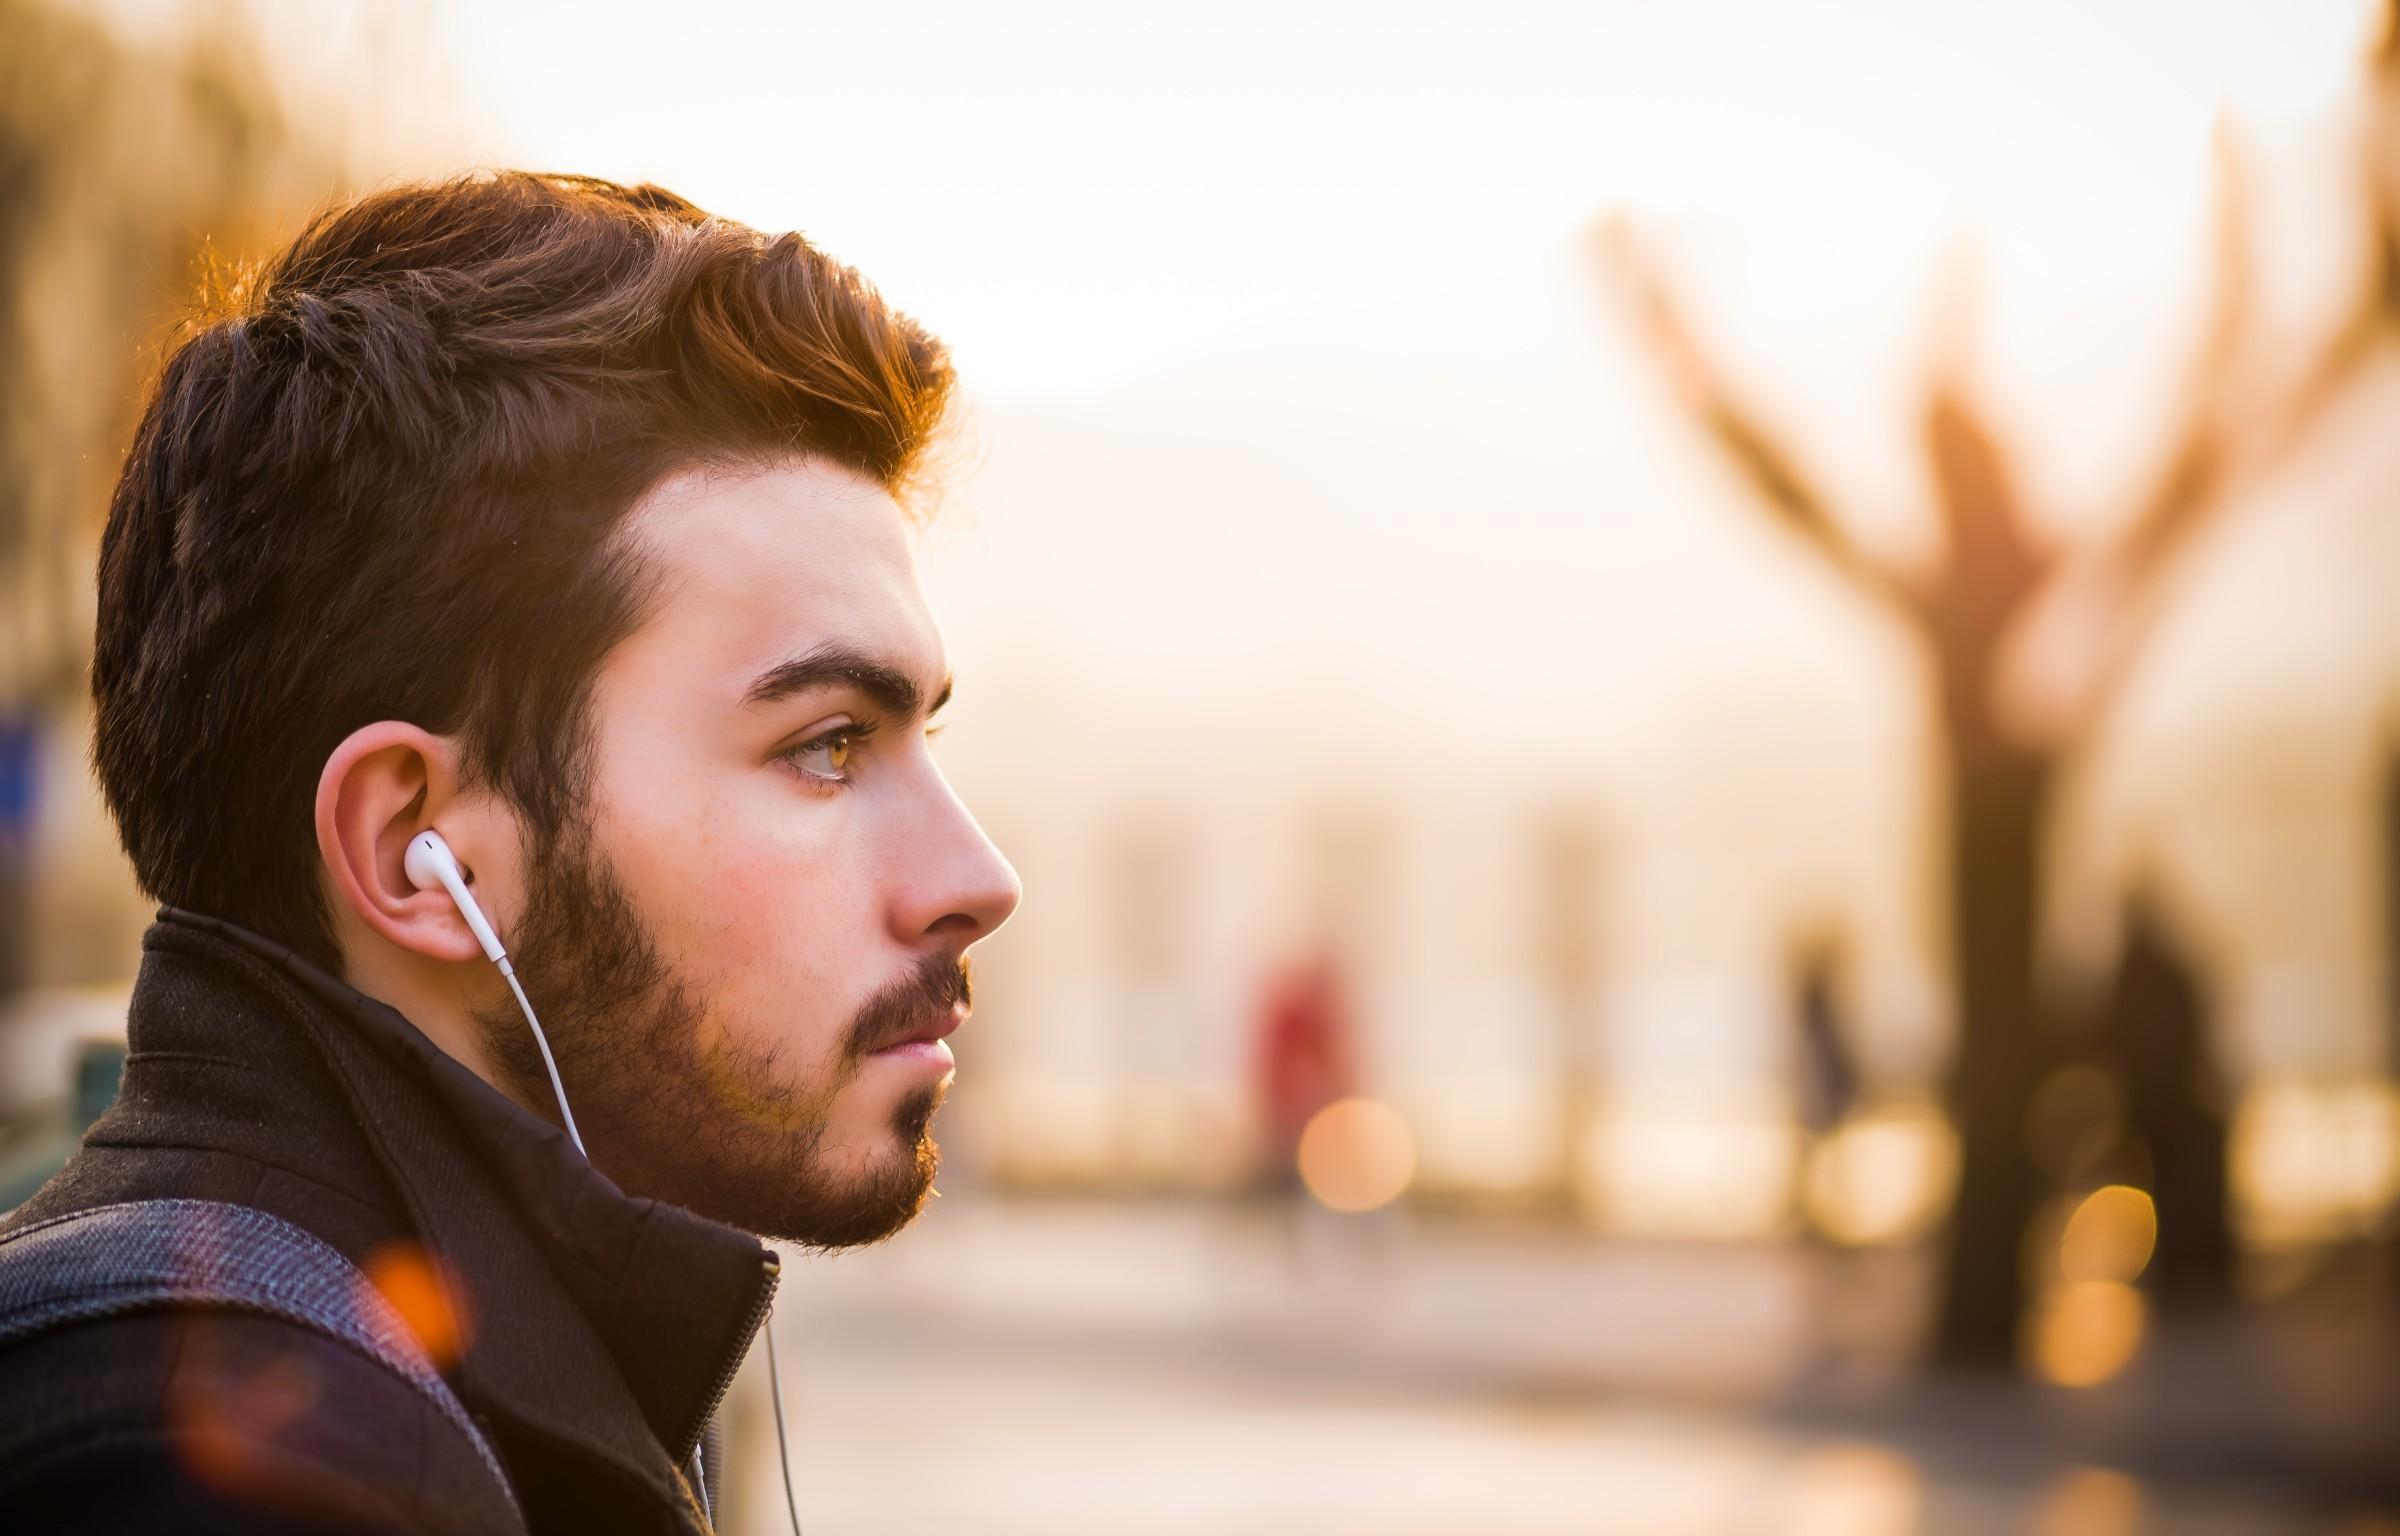 All Erbrecht Fachartikel im Audio Format anhören - Podcasts